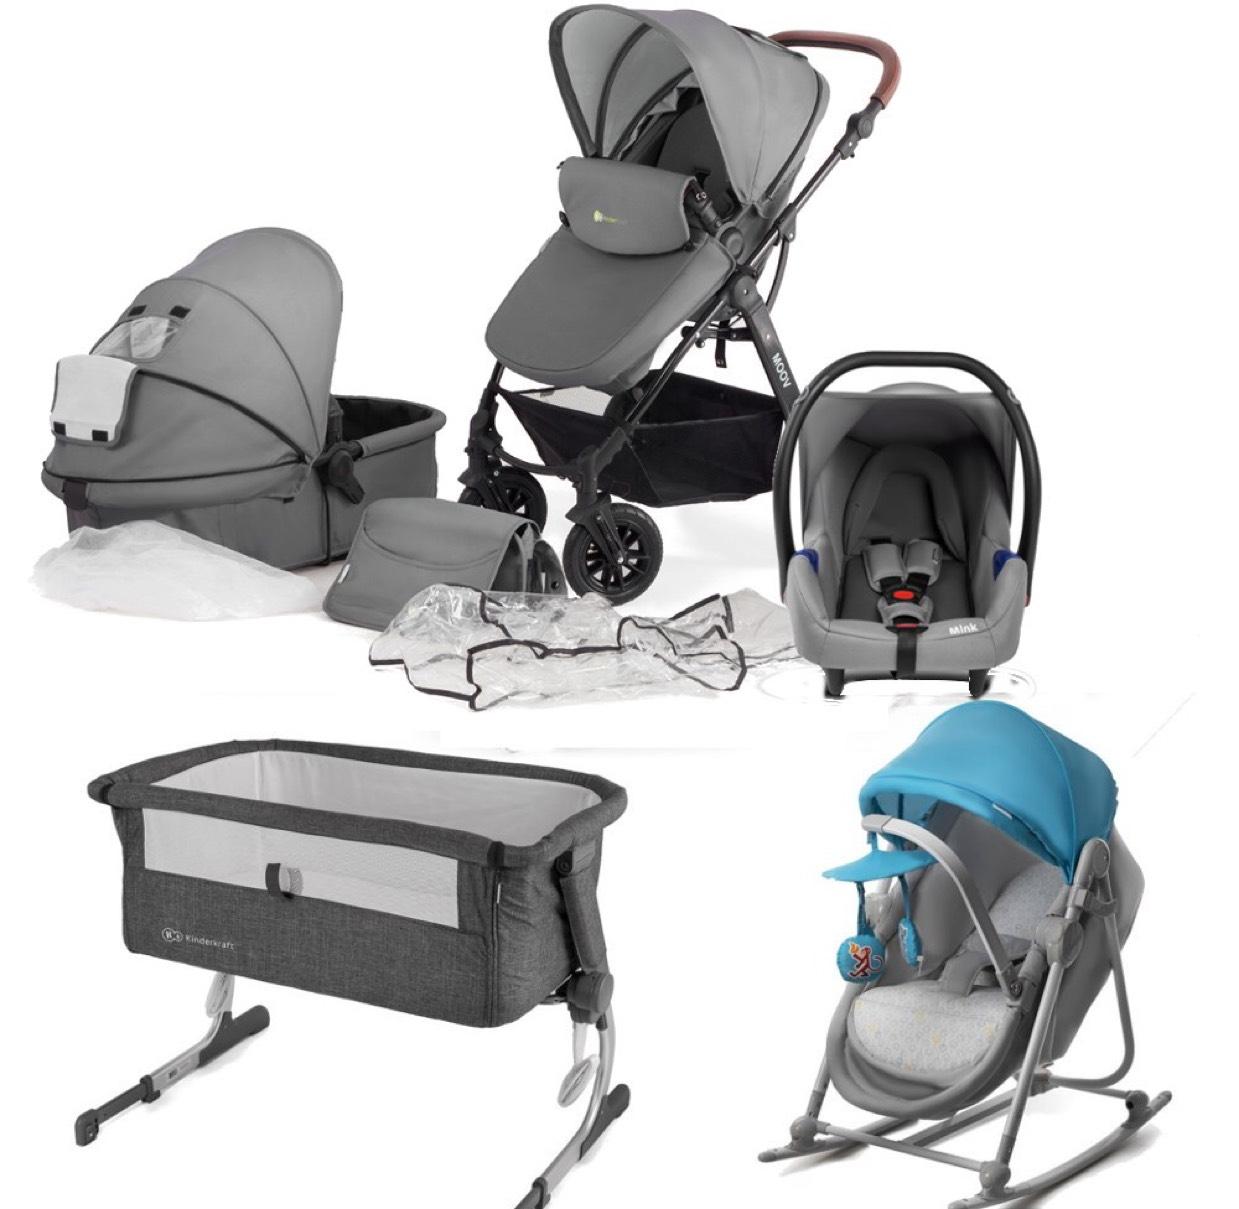 KinderKraft Moov Starter Bundle £379.95 @ Preciouslittleone discount offer